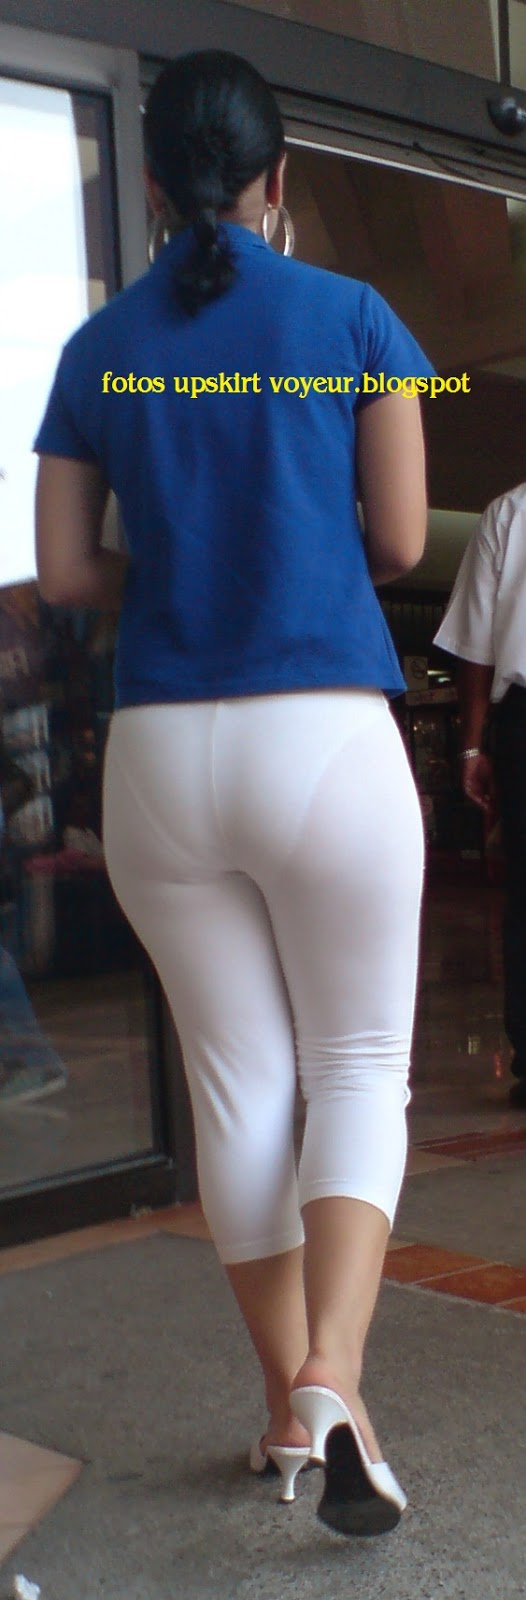 Leggins blancos transparencia calzon a rayas culazo negra - 2 part 4